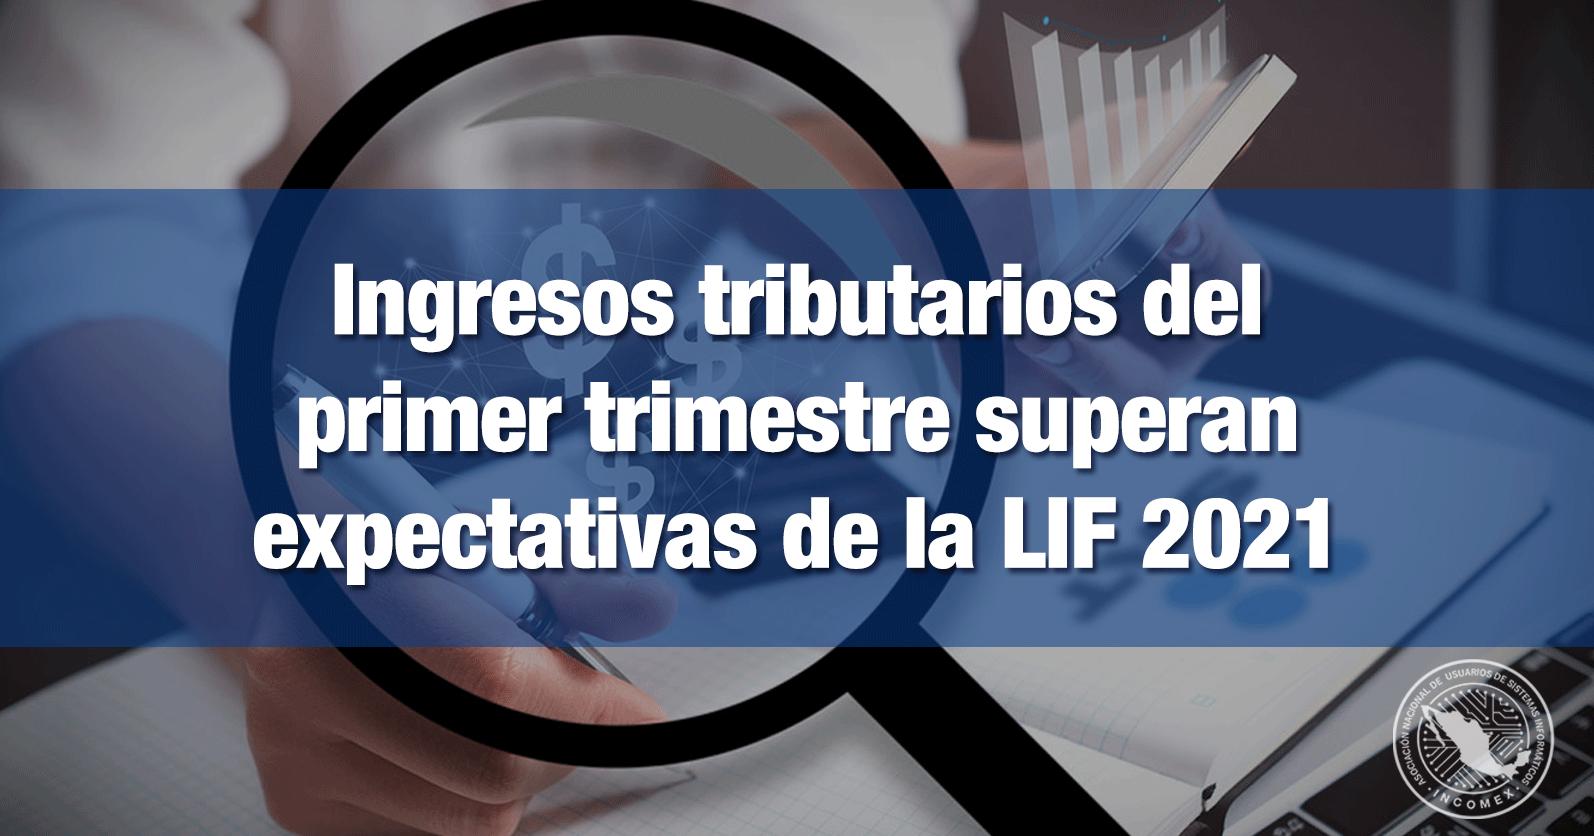 Ingresos tributarios del primer trimestre superan expectativas de la LIF 2021